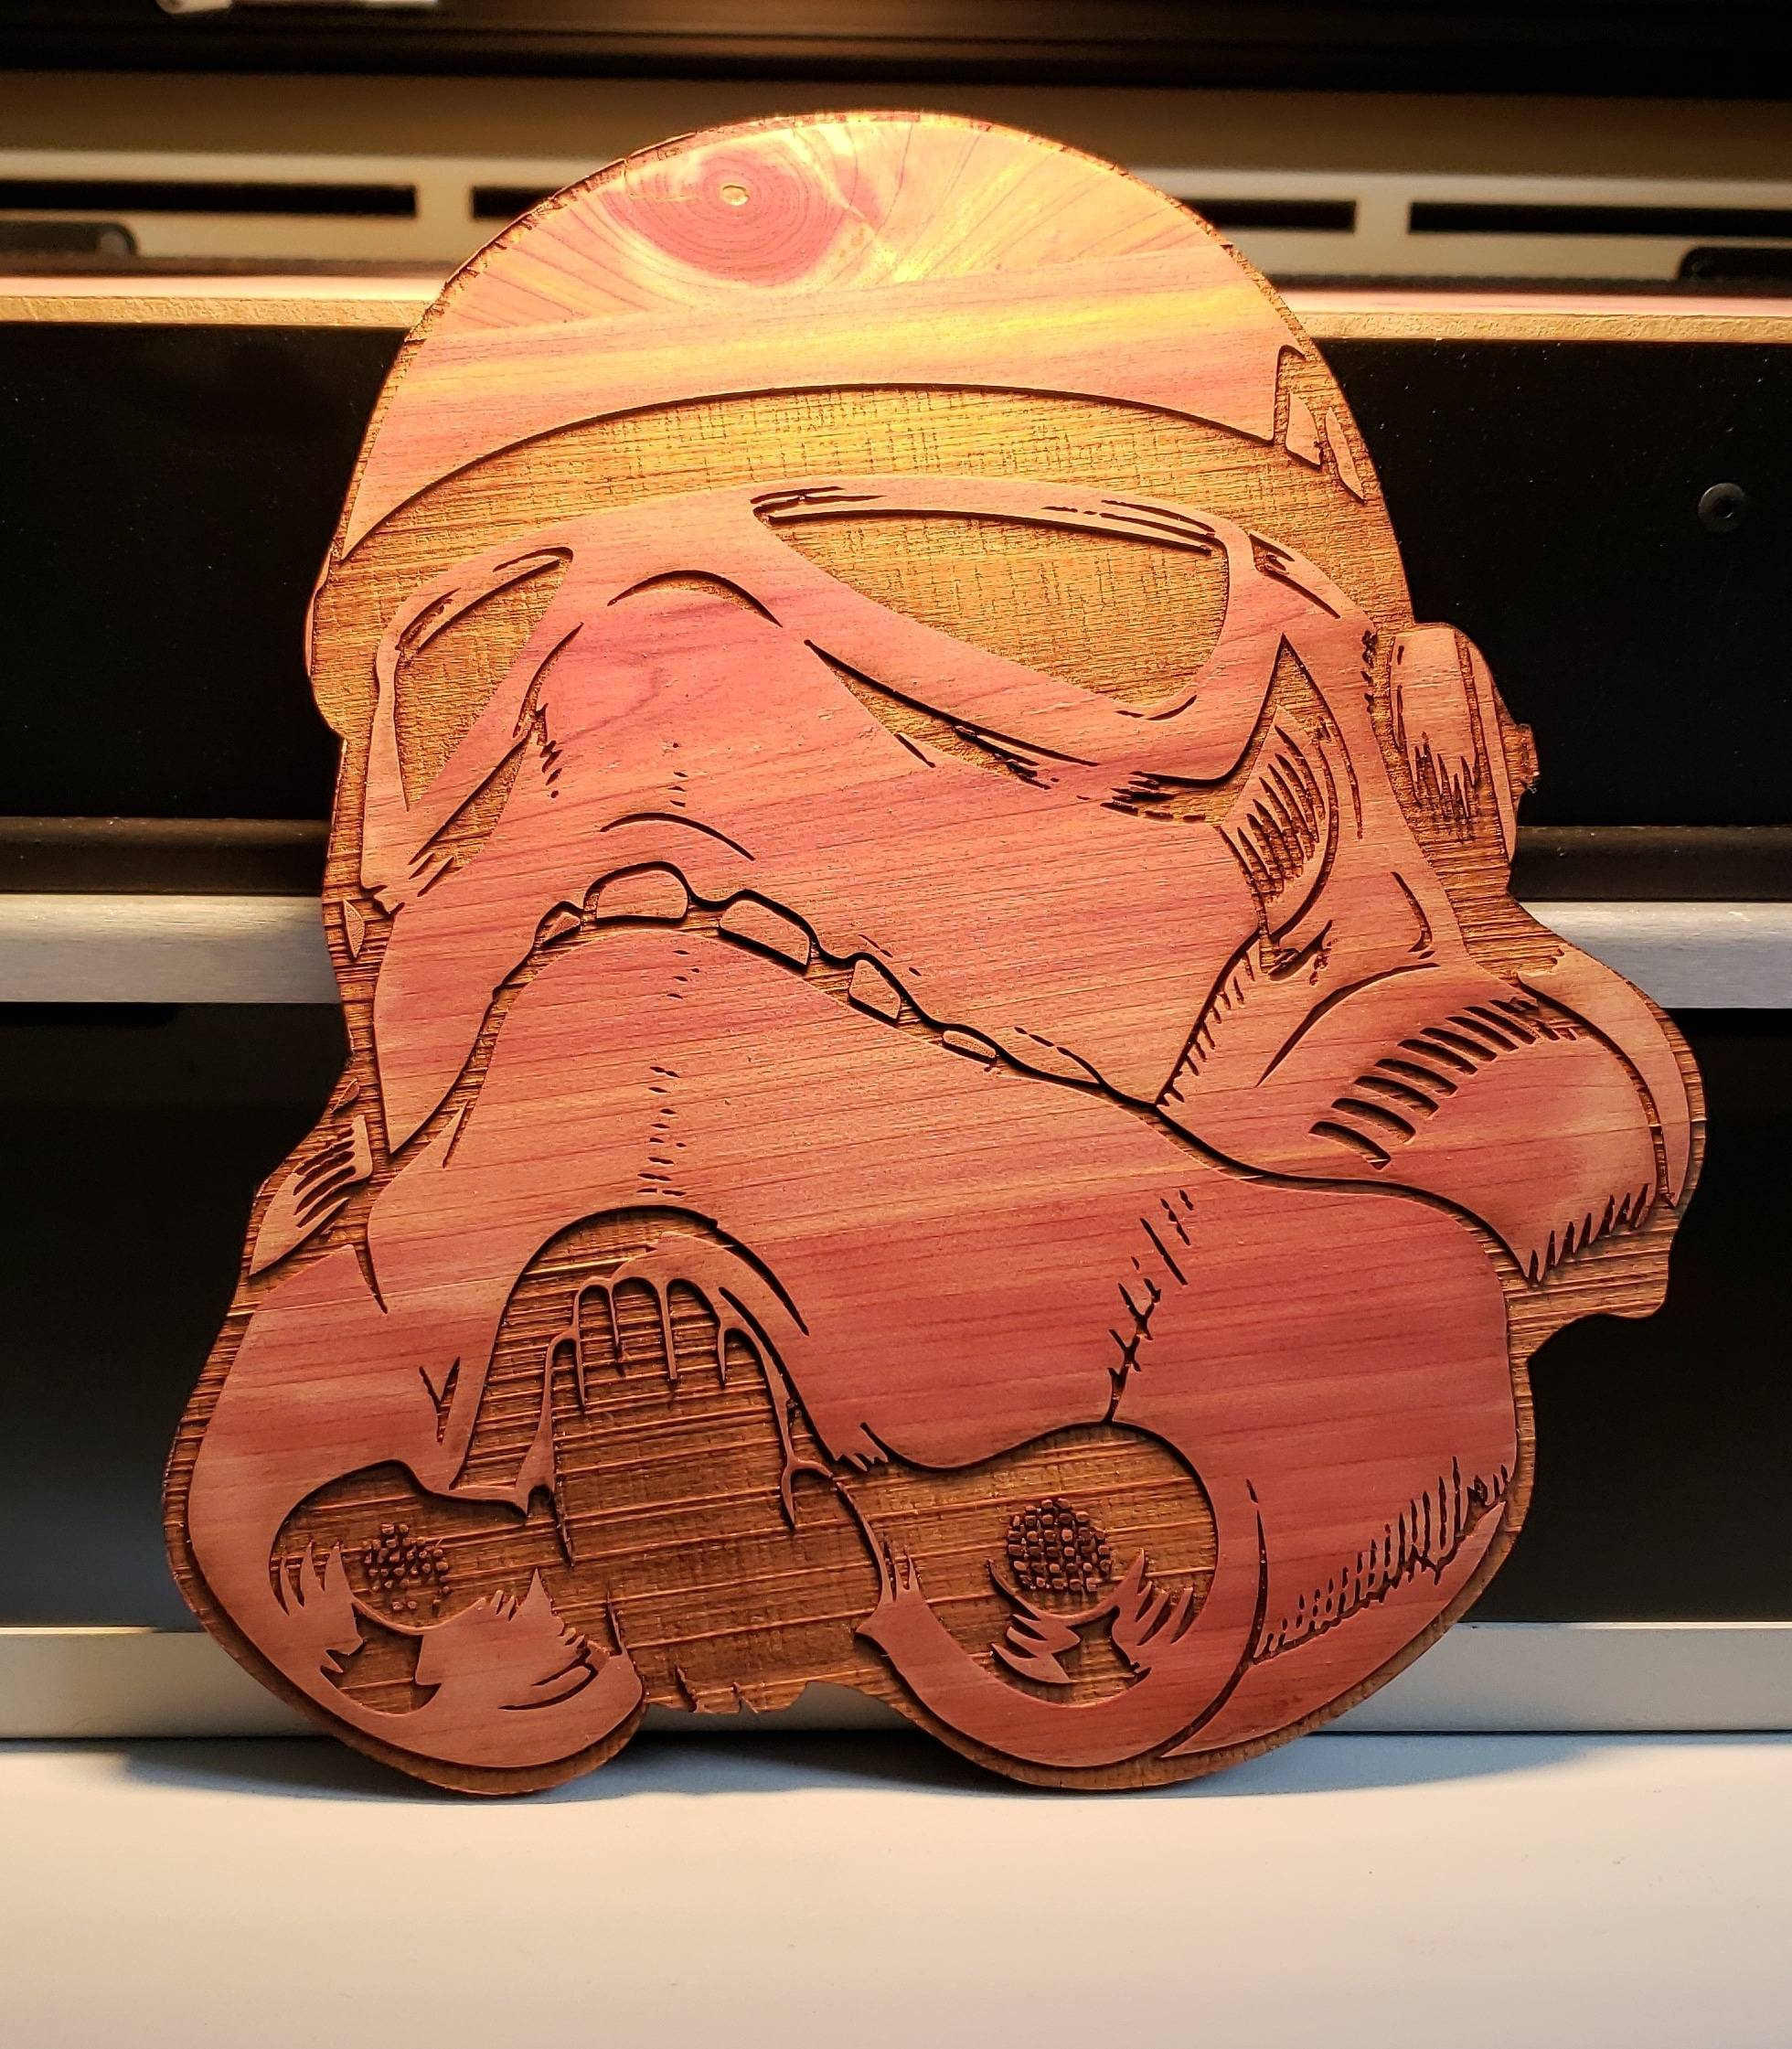 Laser engraved stormtrooper helmet